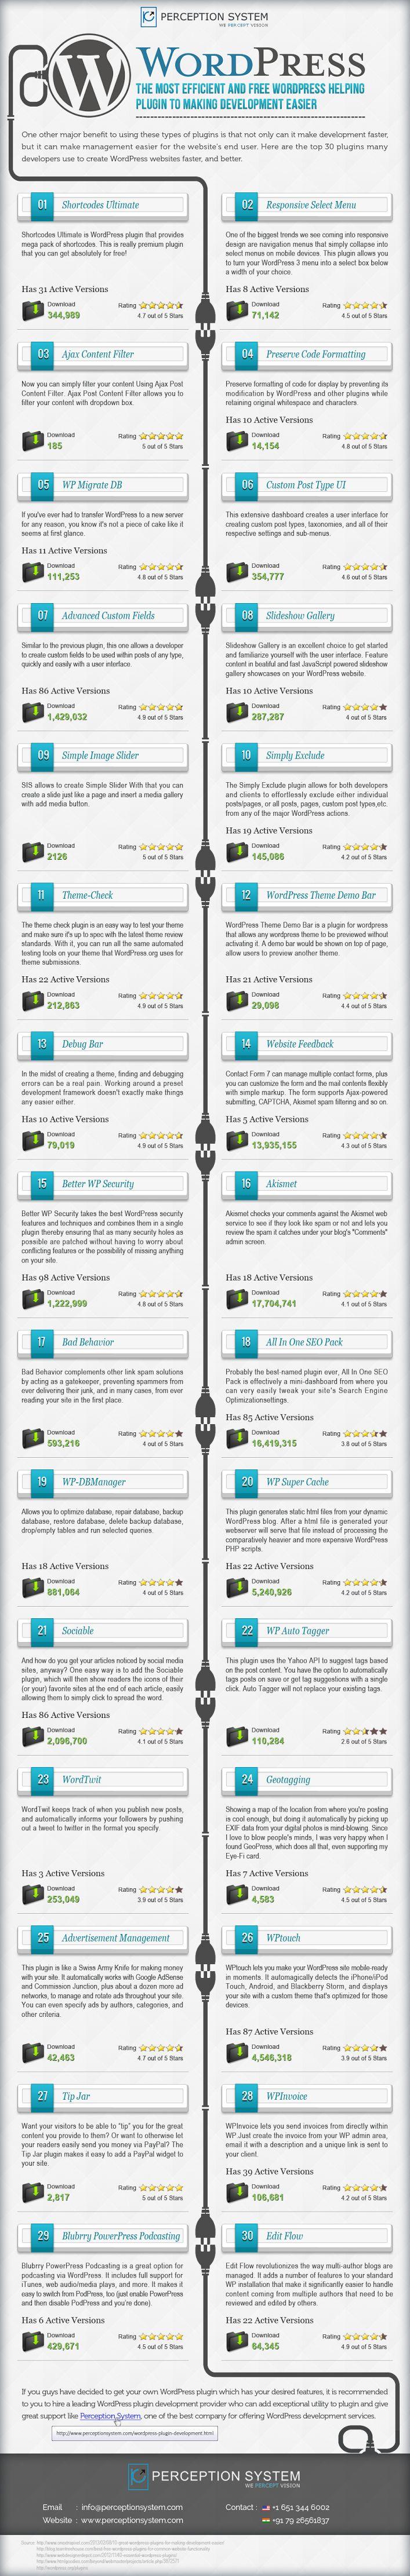 Top 30 Free WordPress Plug-ins To Make Development Tasks Easier #infographics